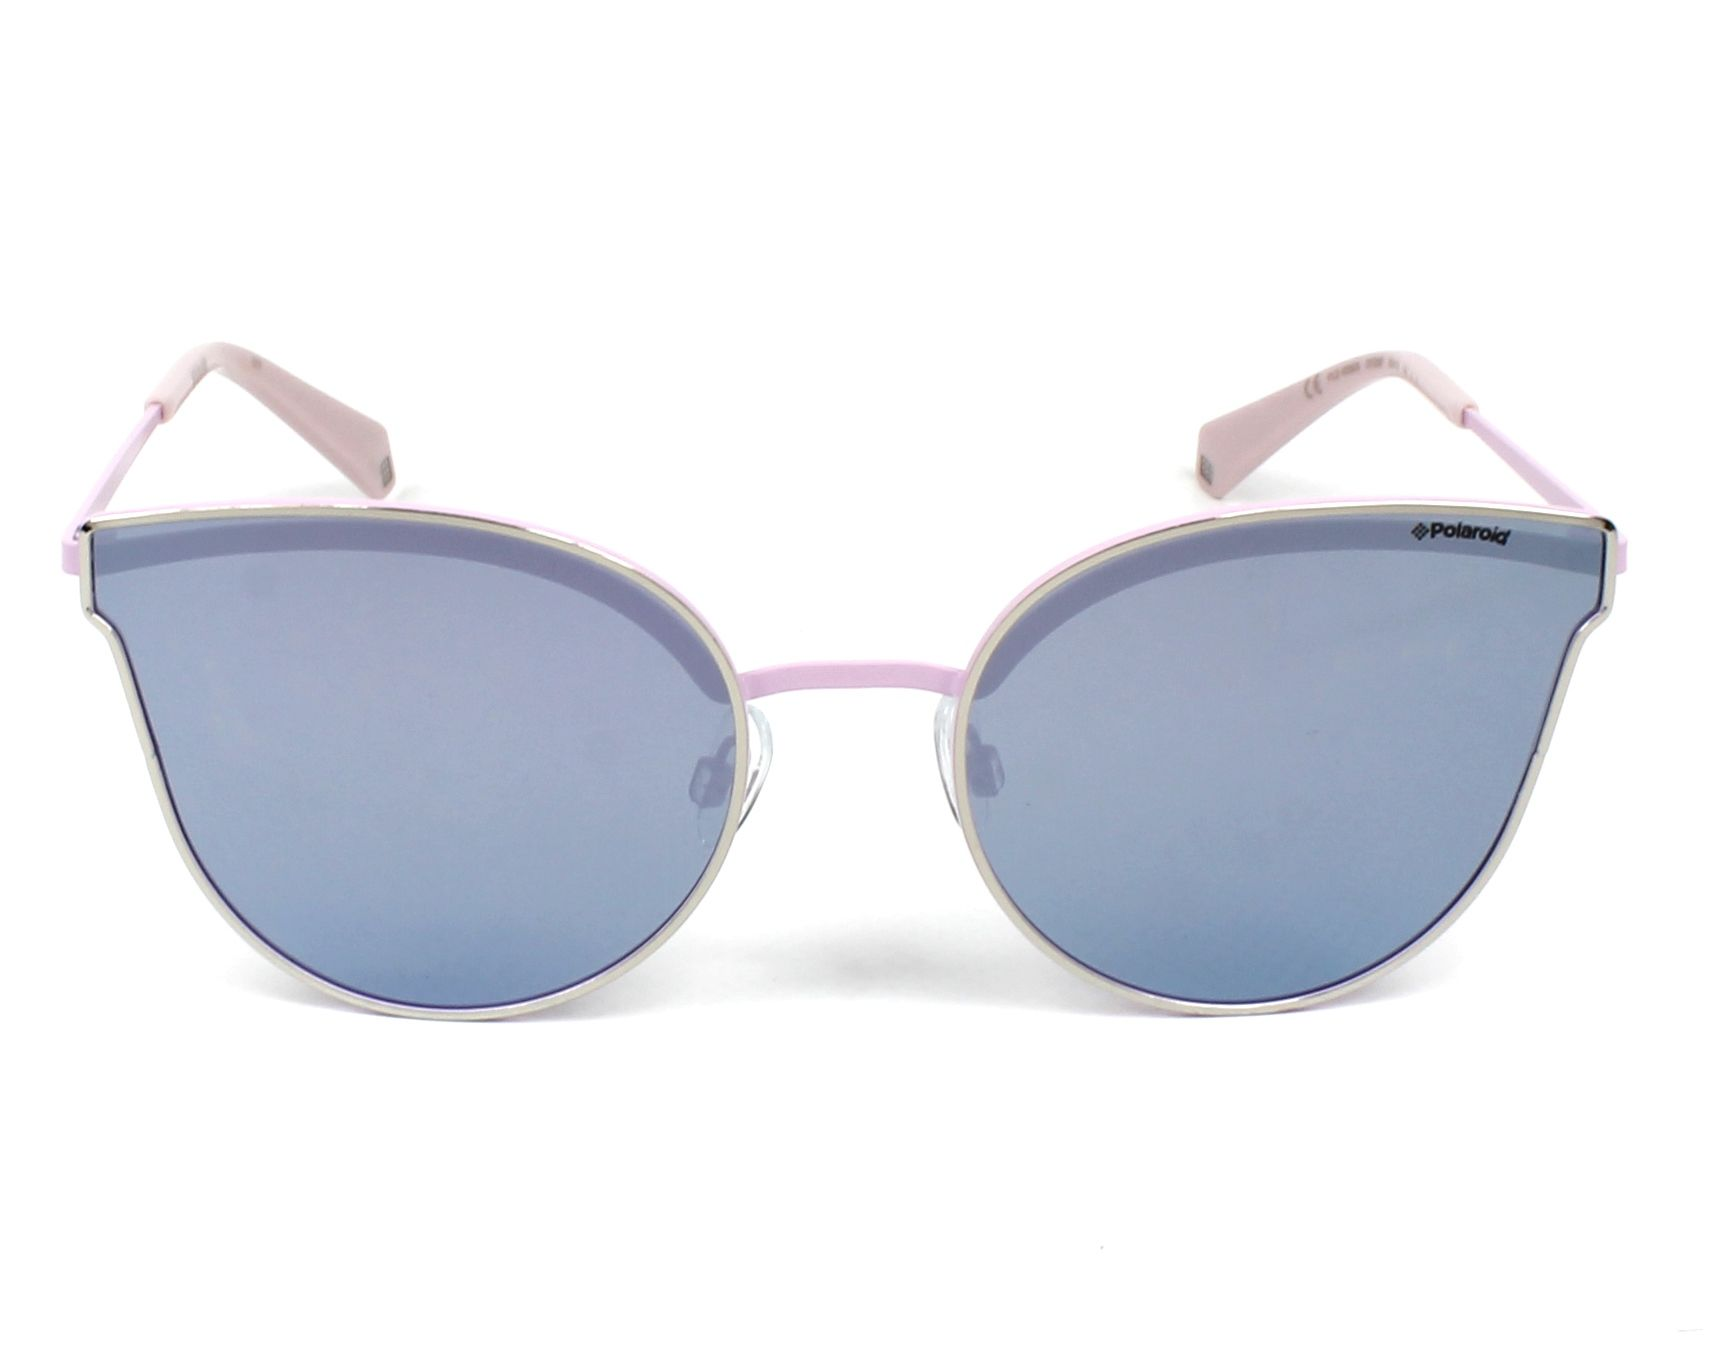 thumbnail Sunglasses Polaroid PLD-4056-S 3YG MF - Rosa Gun front view 1463a3267e8